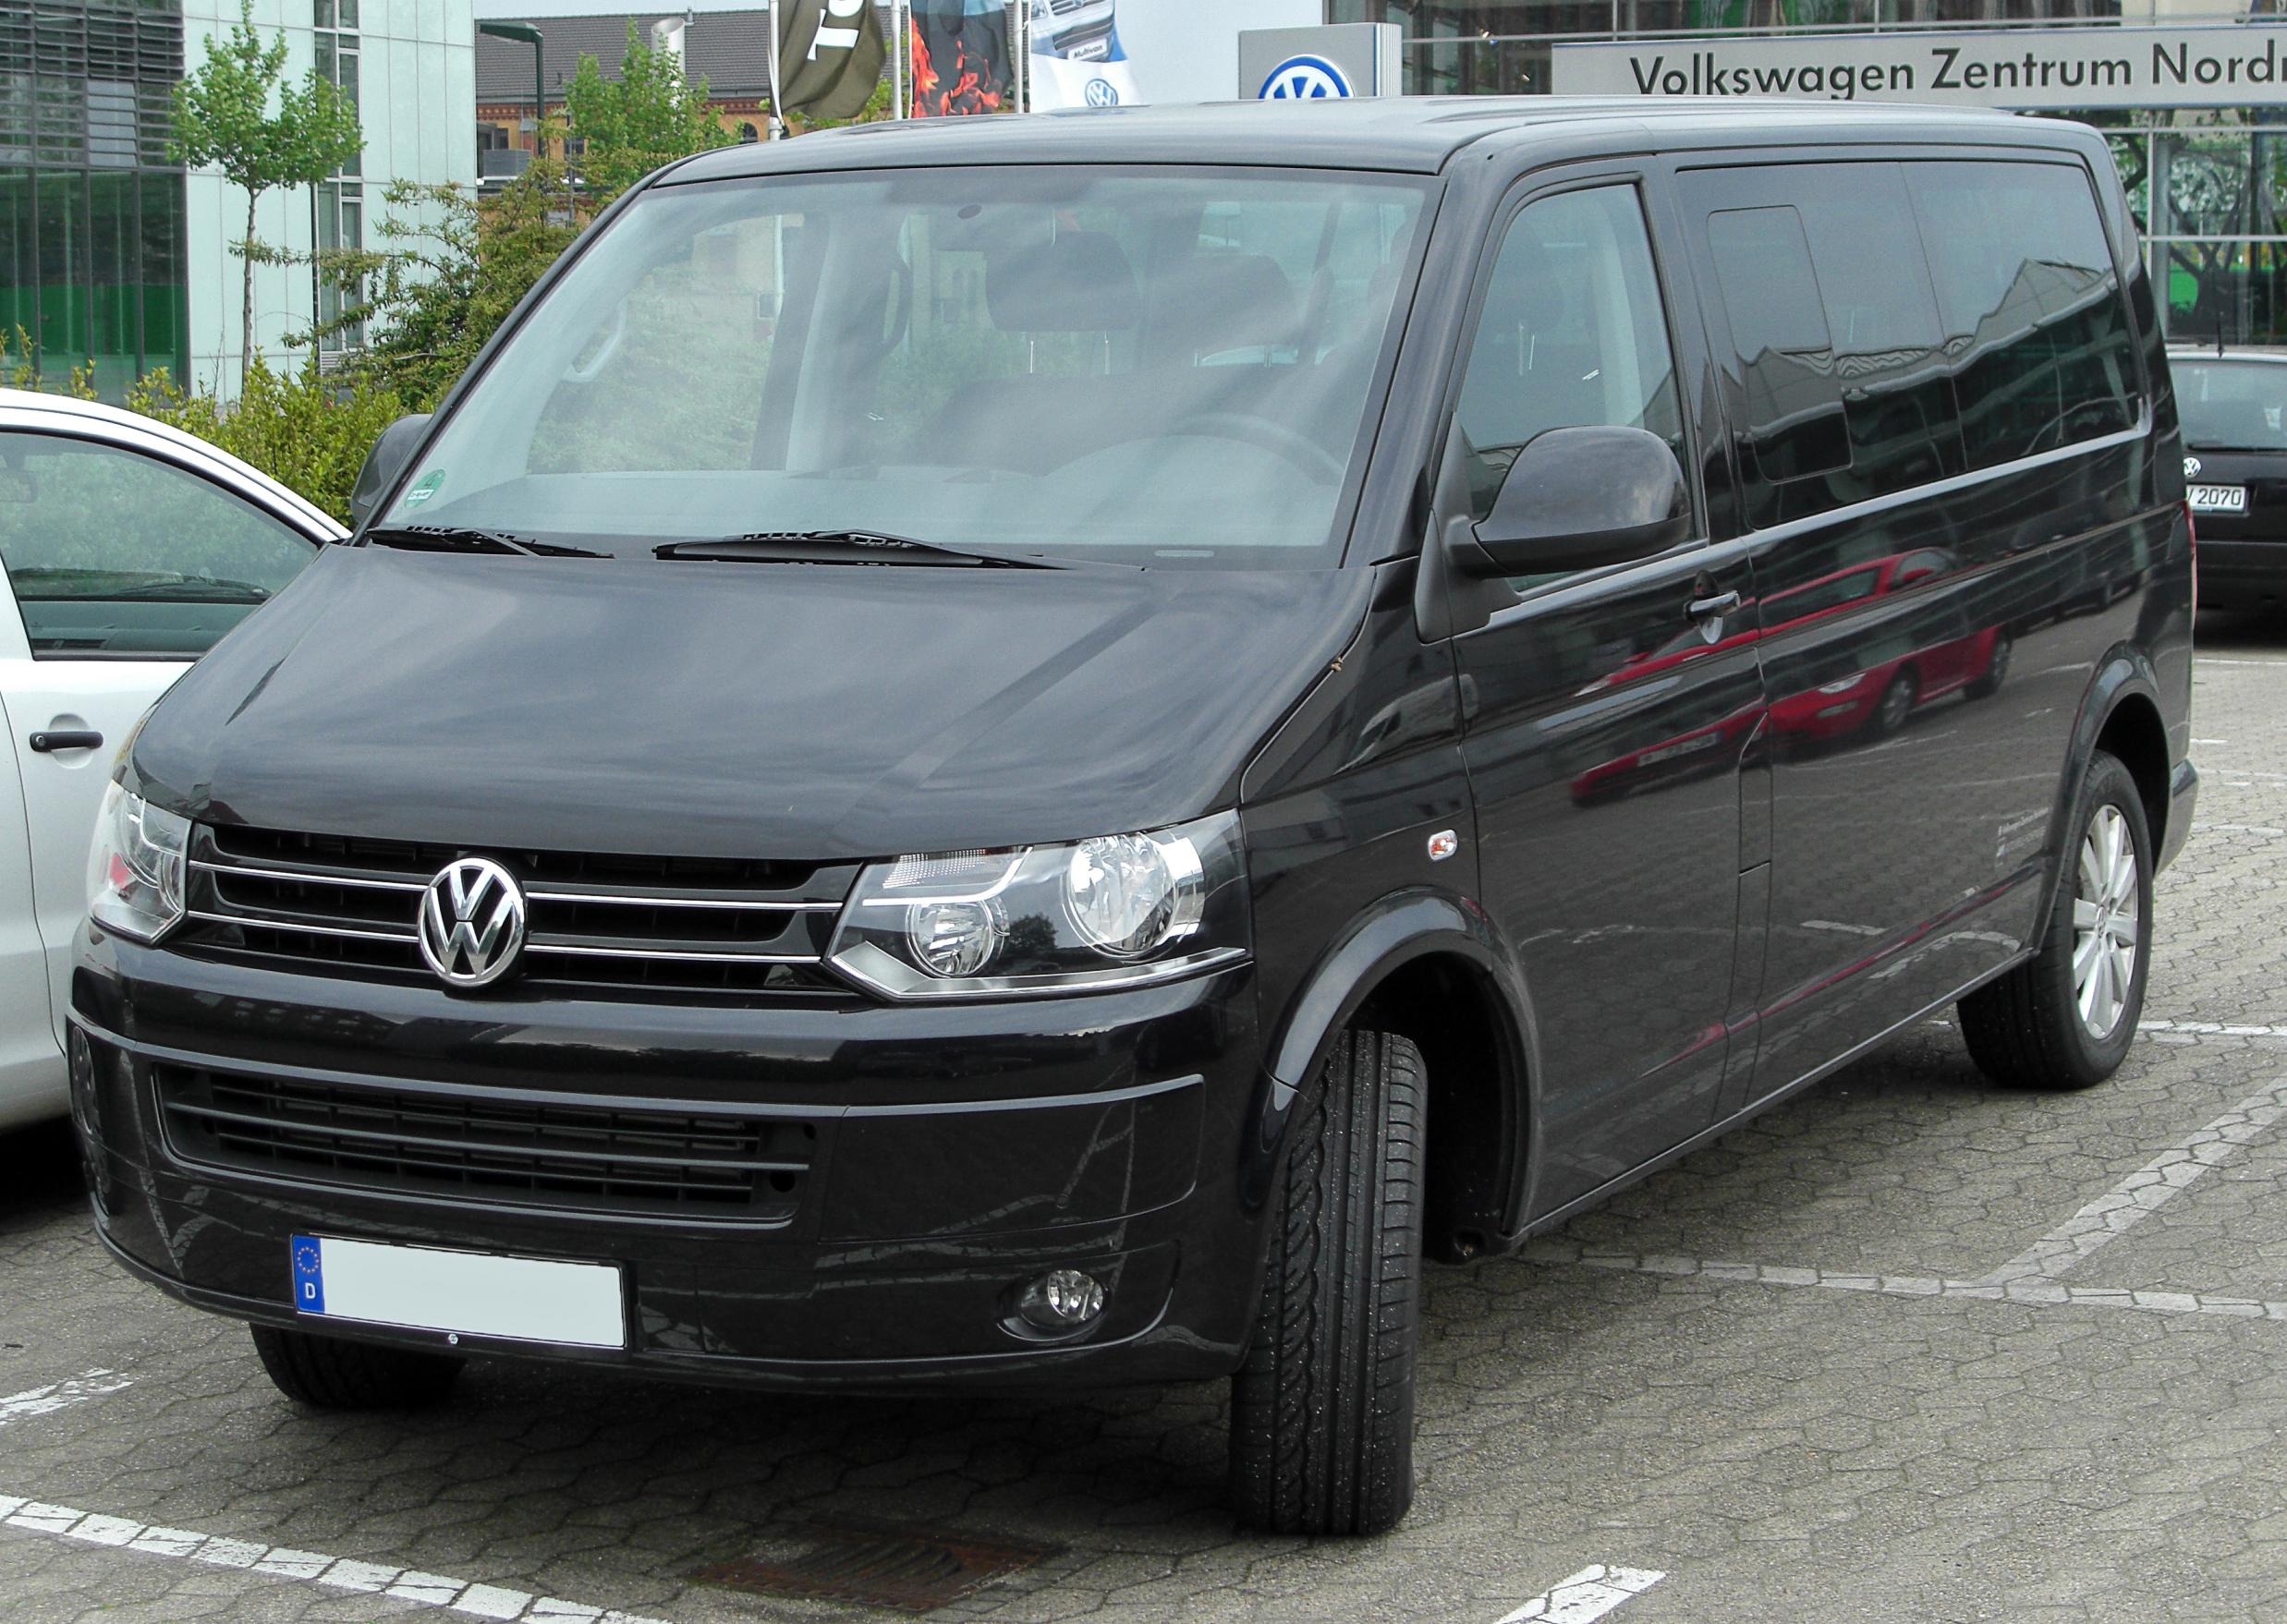 volkswagen caravelle carat reviews volkswagen caravelle carat car reviews. Black Bedroom Furniture Sets. Home Design Ideas